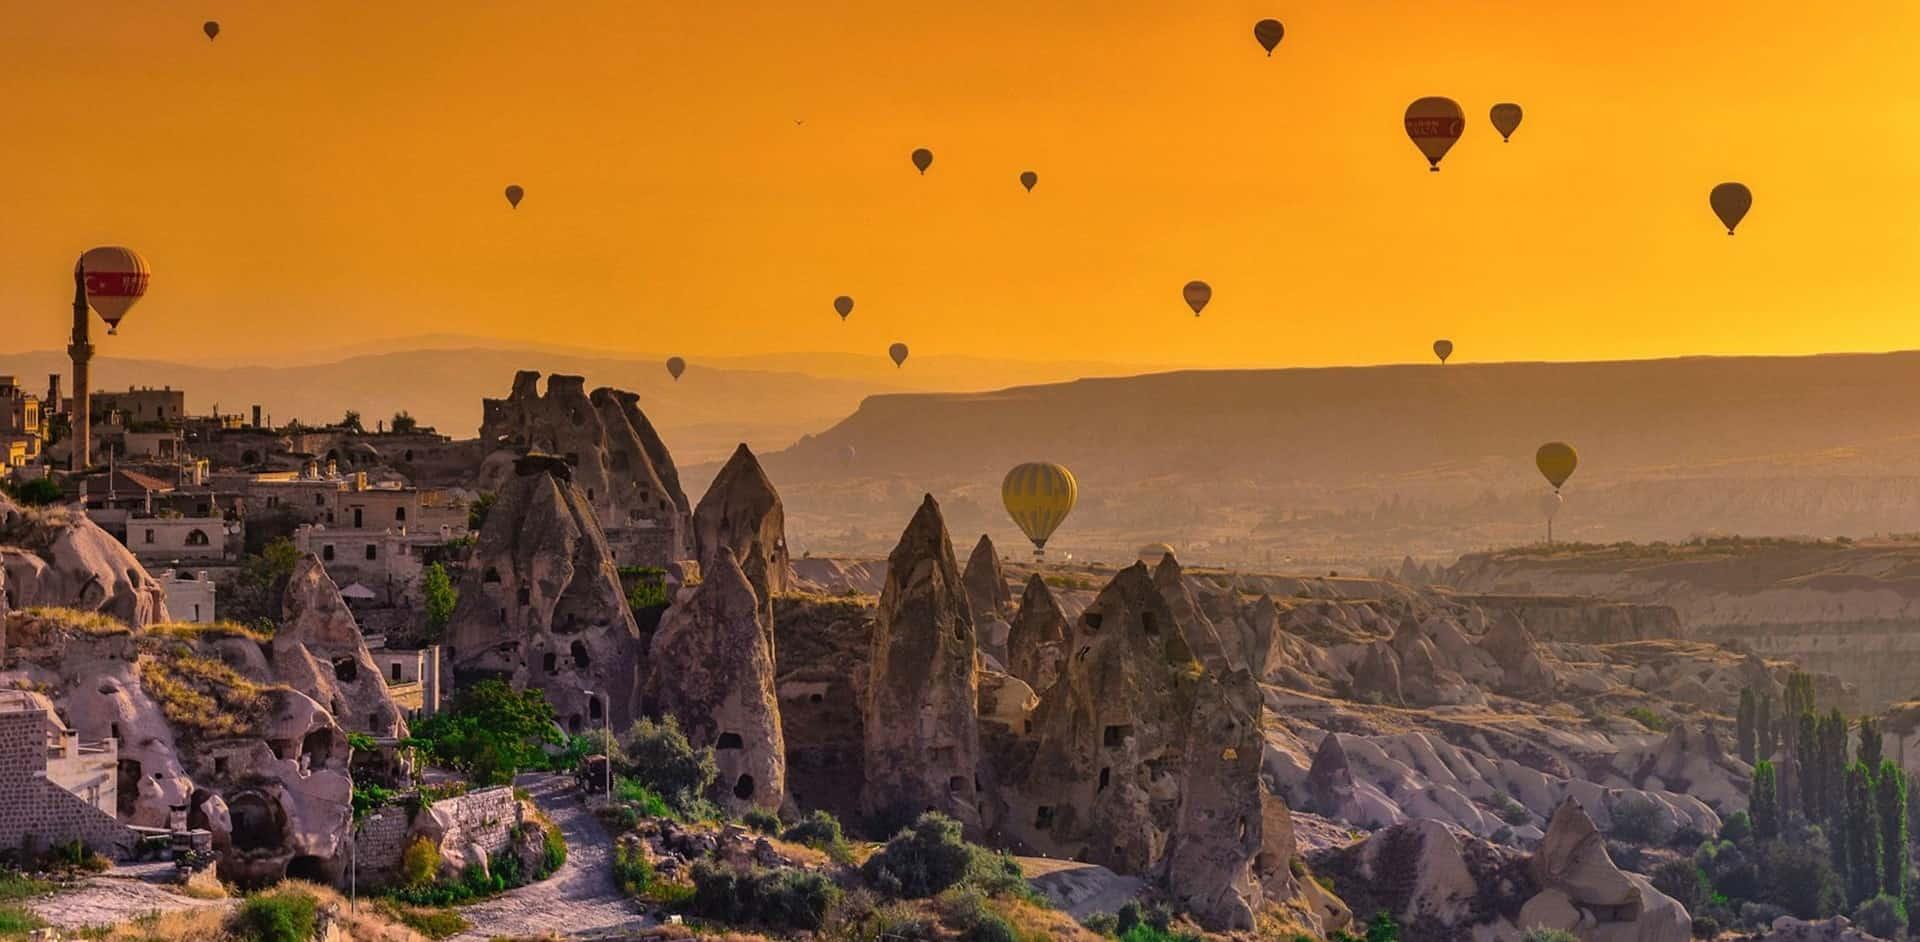 Balloning over Cappadocia, Turkey